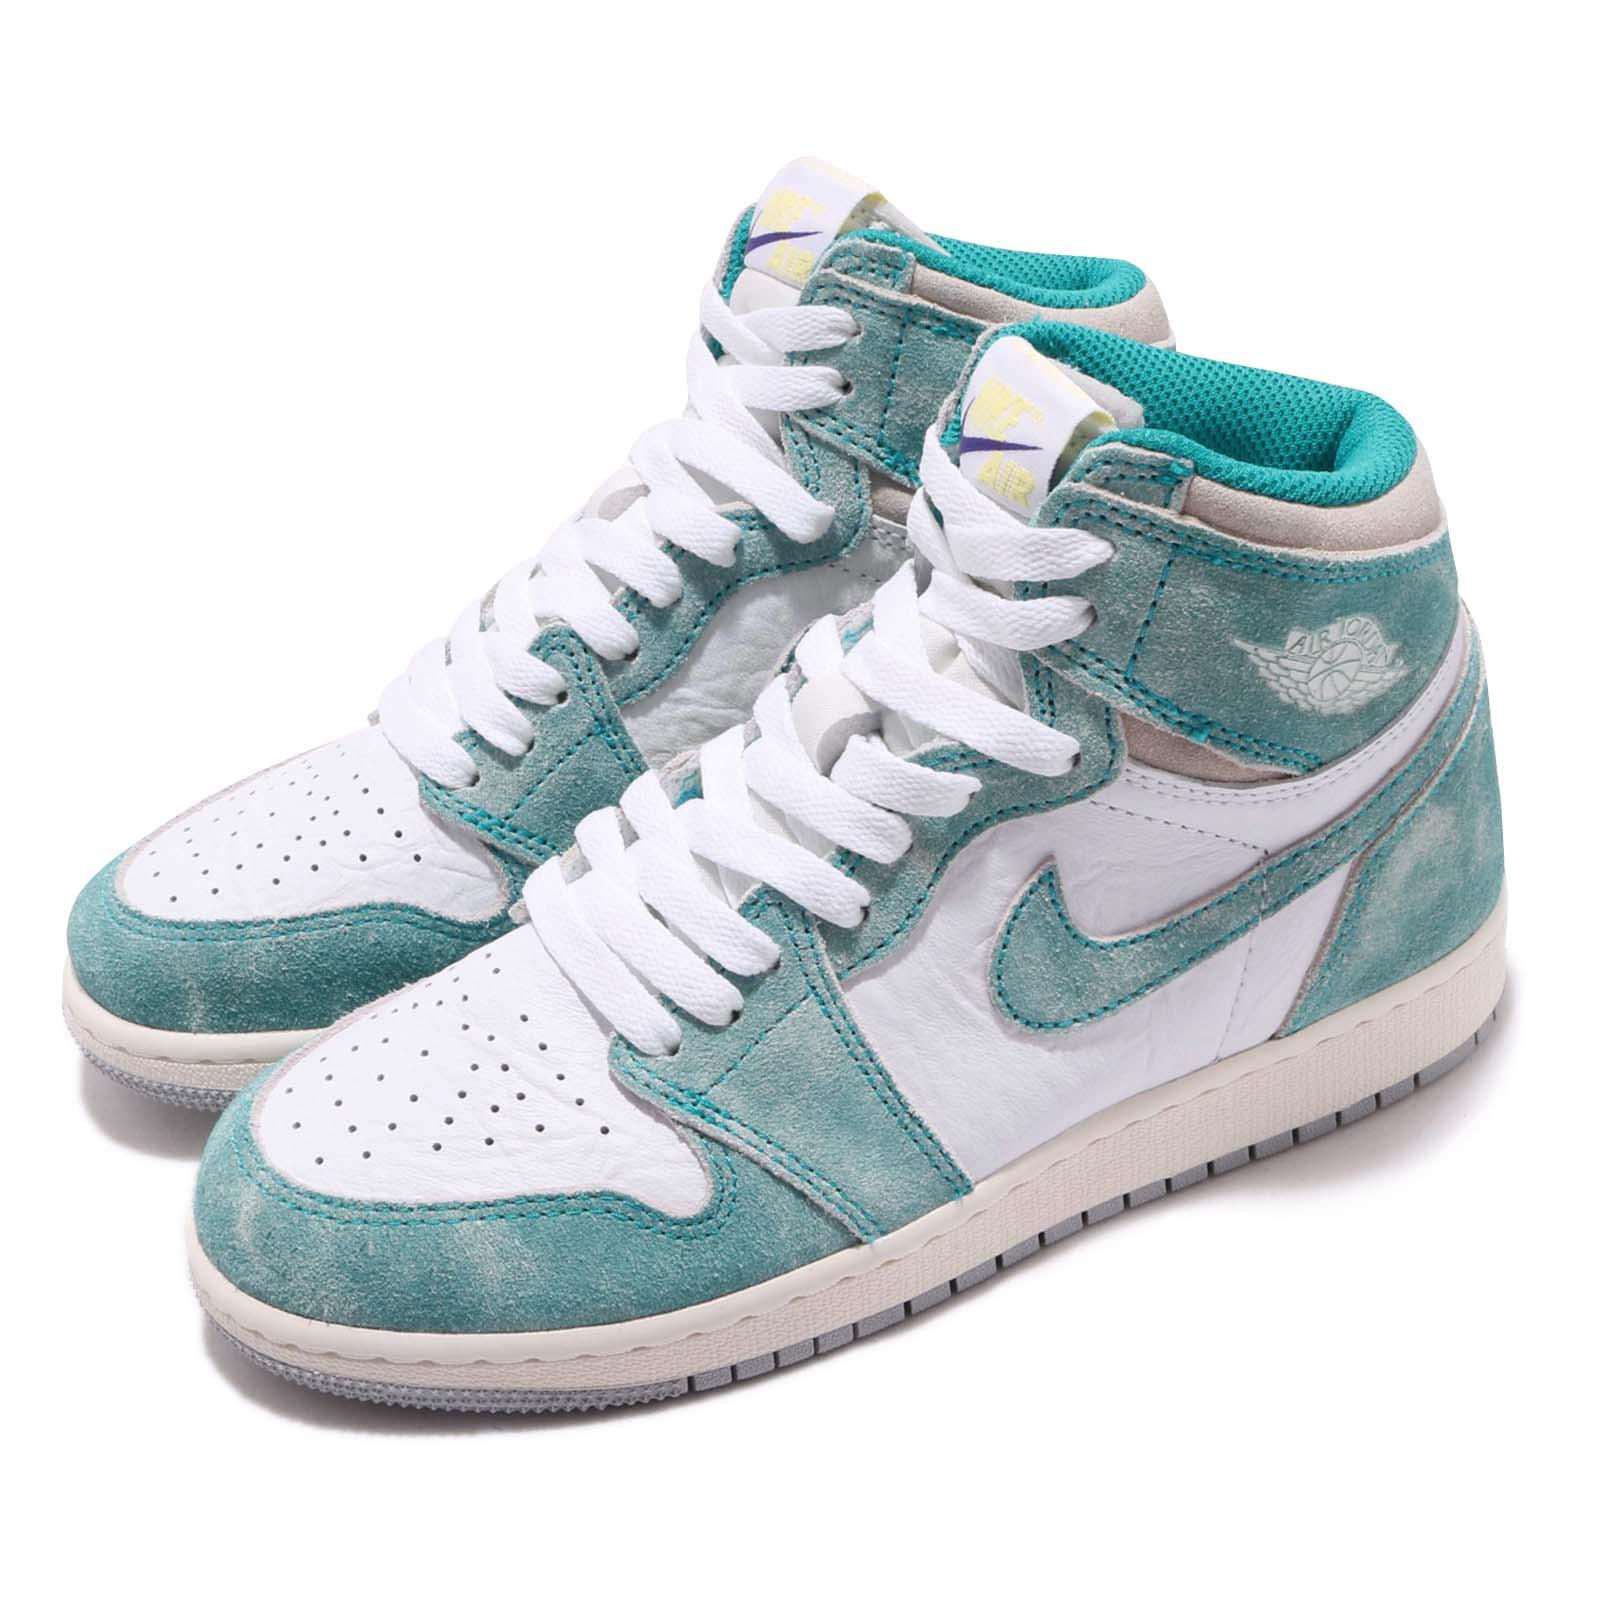 Nike Air Jordan 1 Retro 女鞋 575441-311